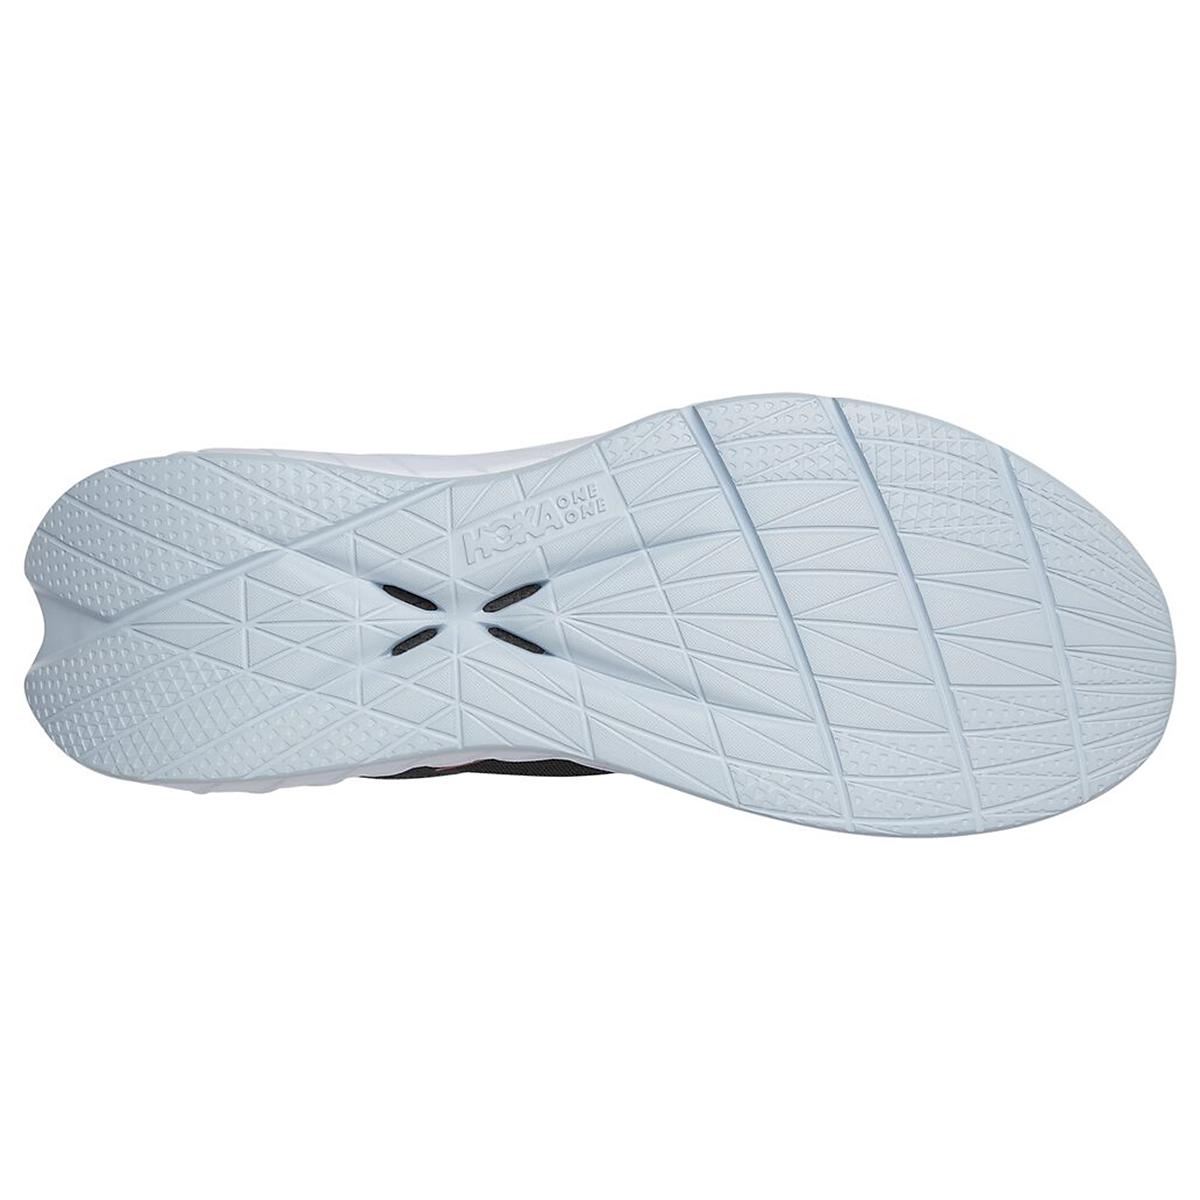 Men's Hoka One One Carbon X 2 Running Shoe - Color: Dark Shadow/Fiesta - Size: 7 - Width: Regular, Dark Shadow/Fiesta, large, image 4